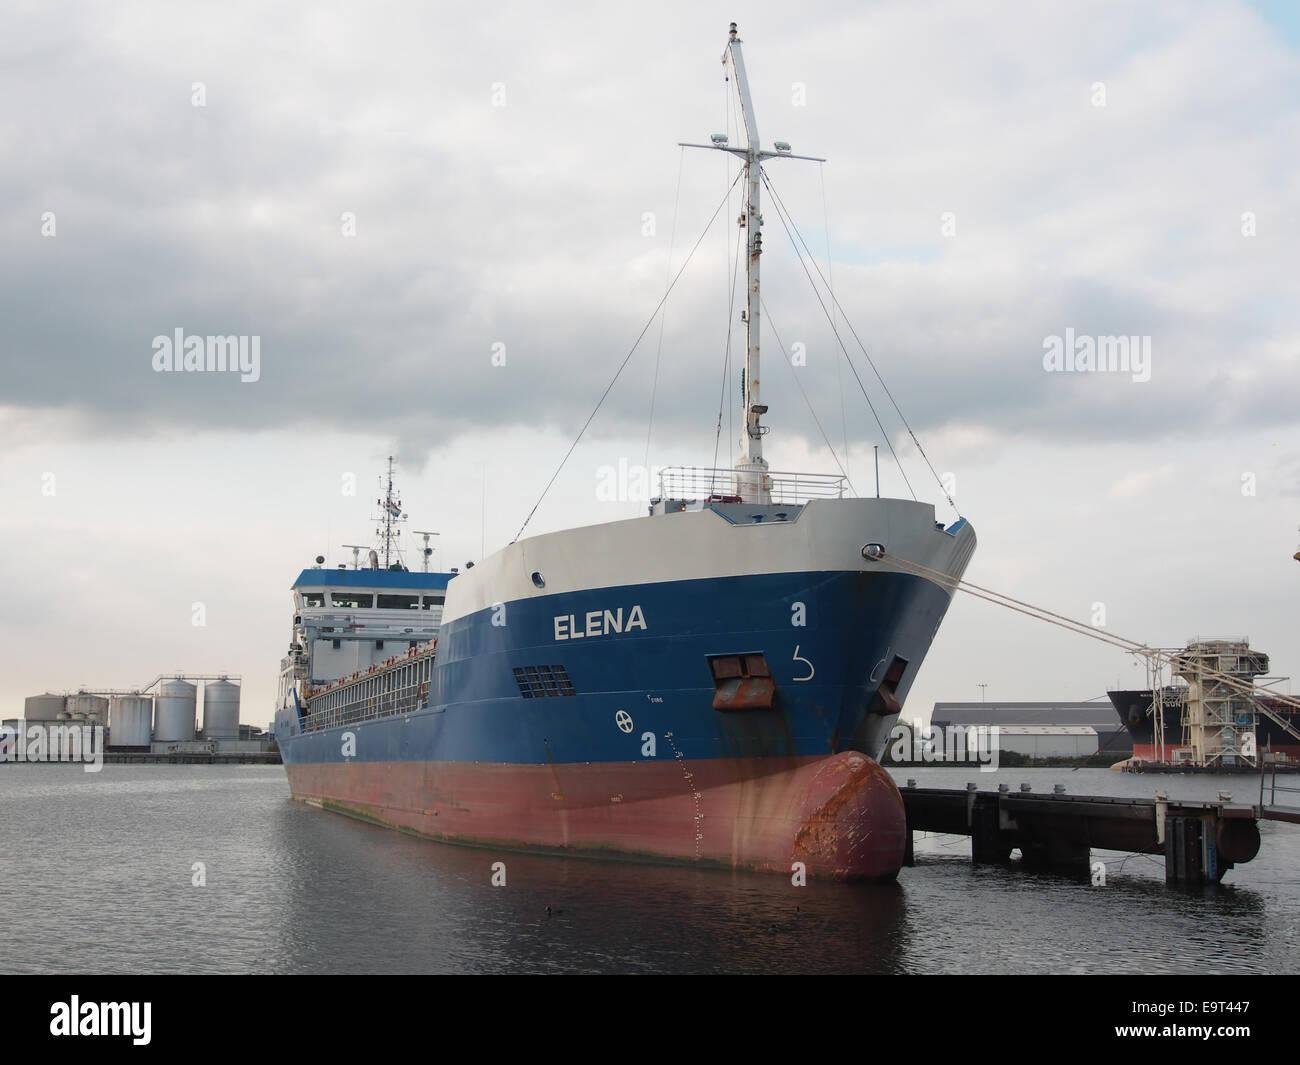 Elena, IMO 9574315 at the Mercuriushaven, Port of Amsterdam, pic1 - Stock Image